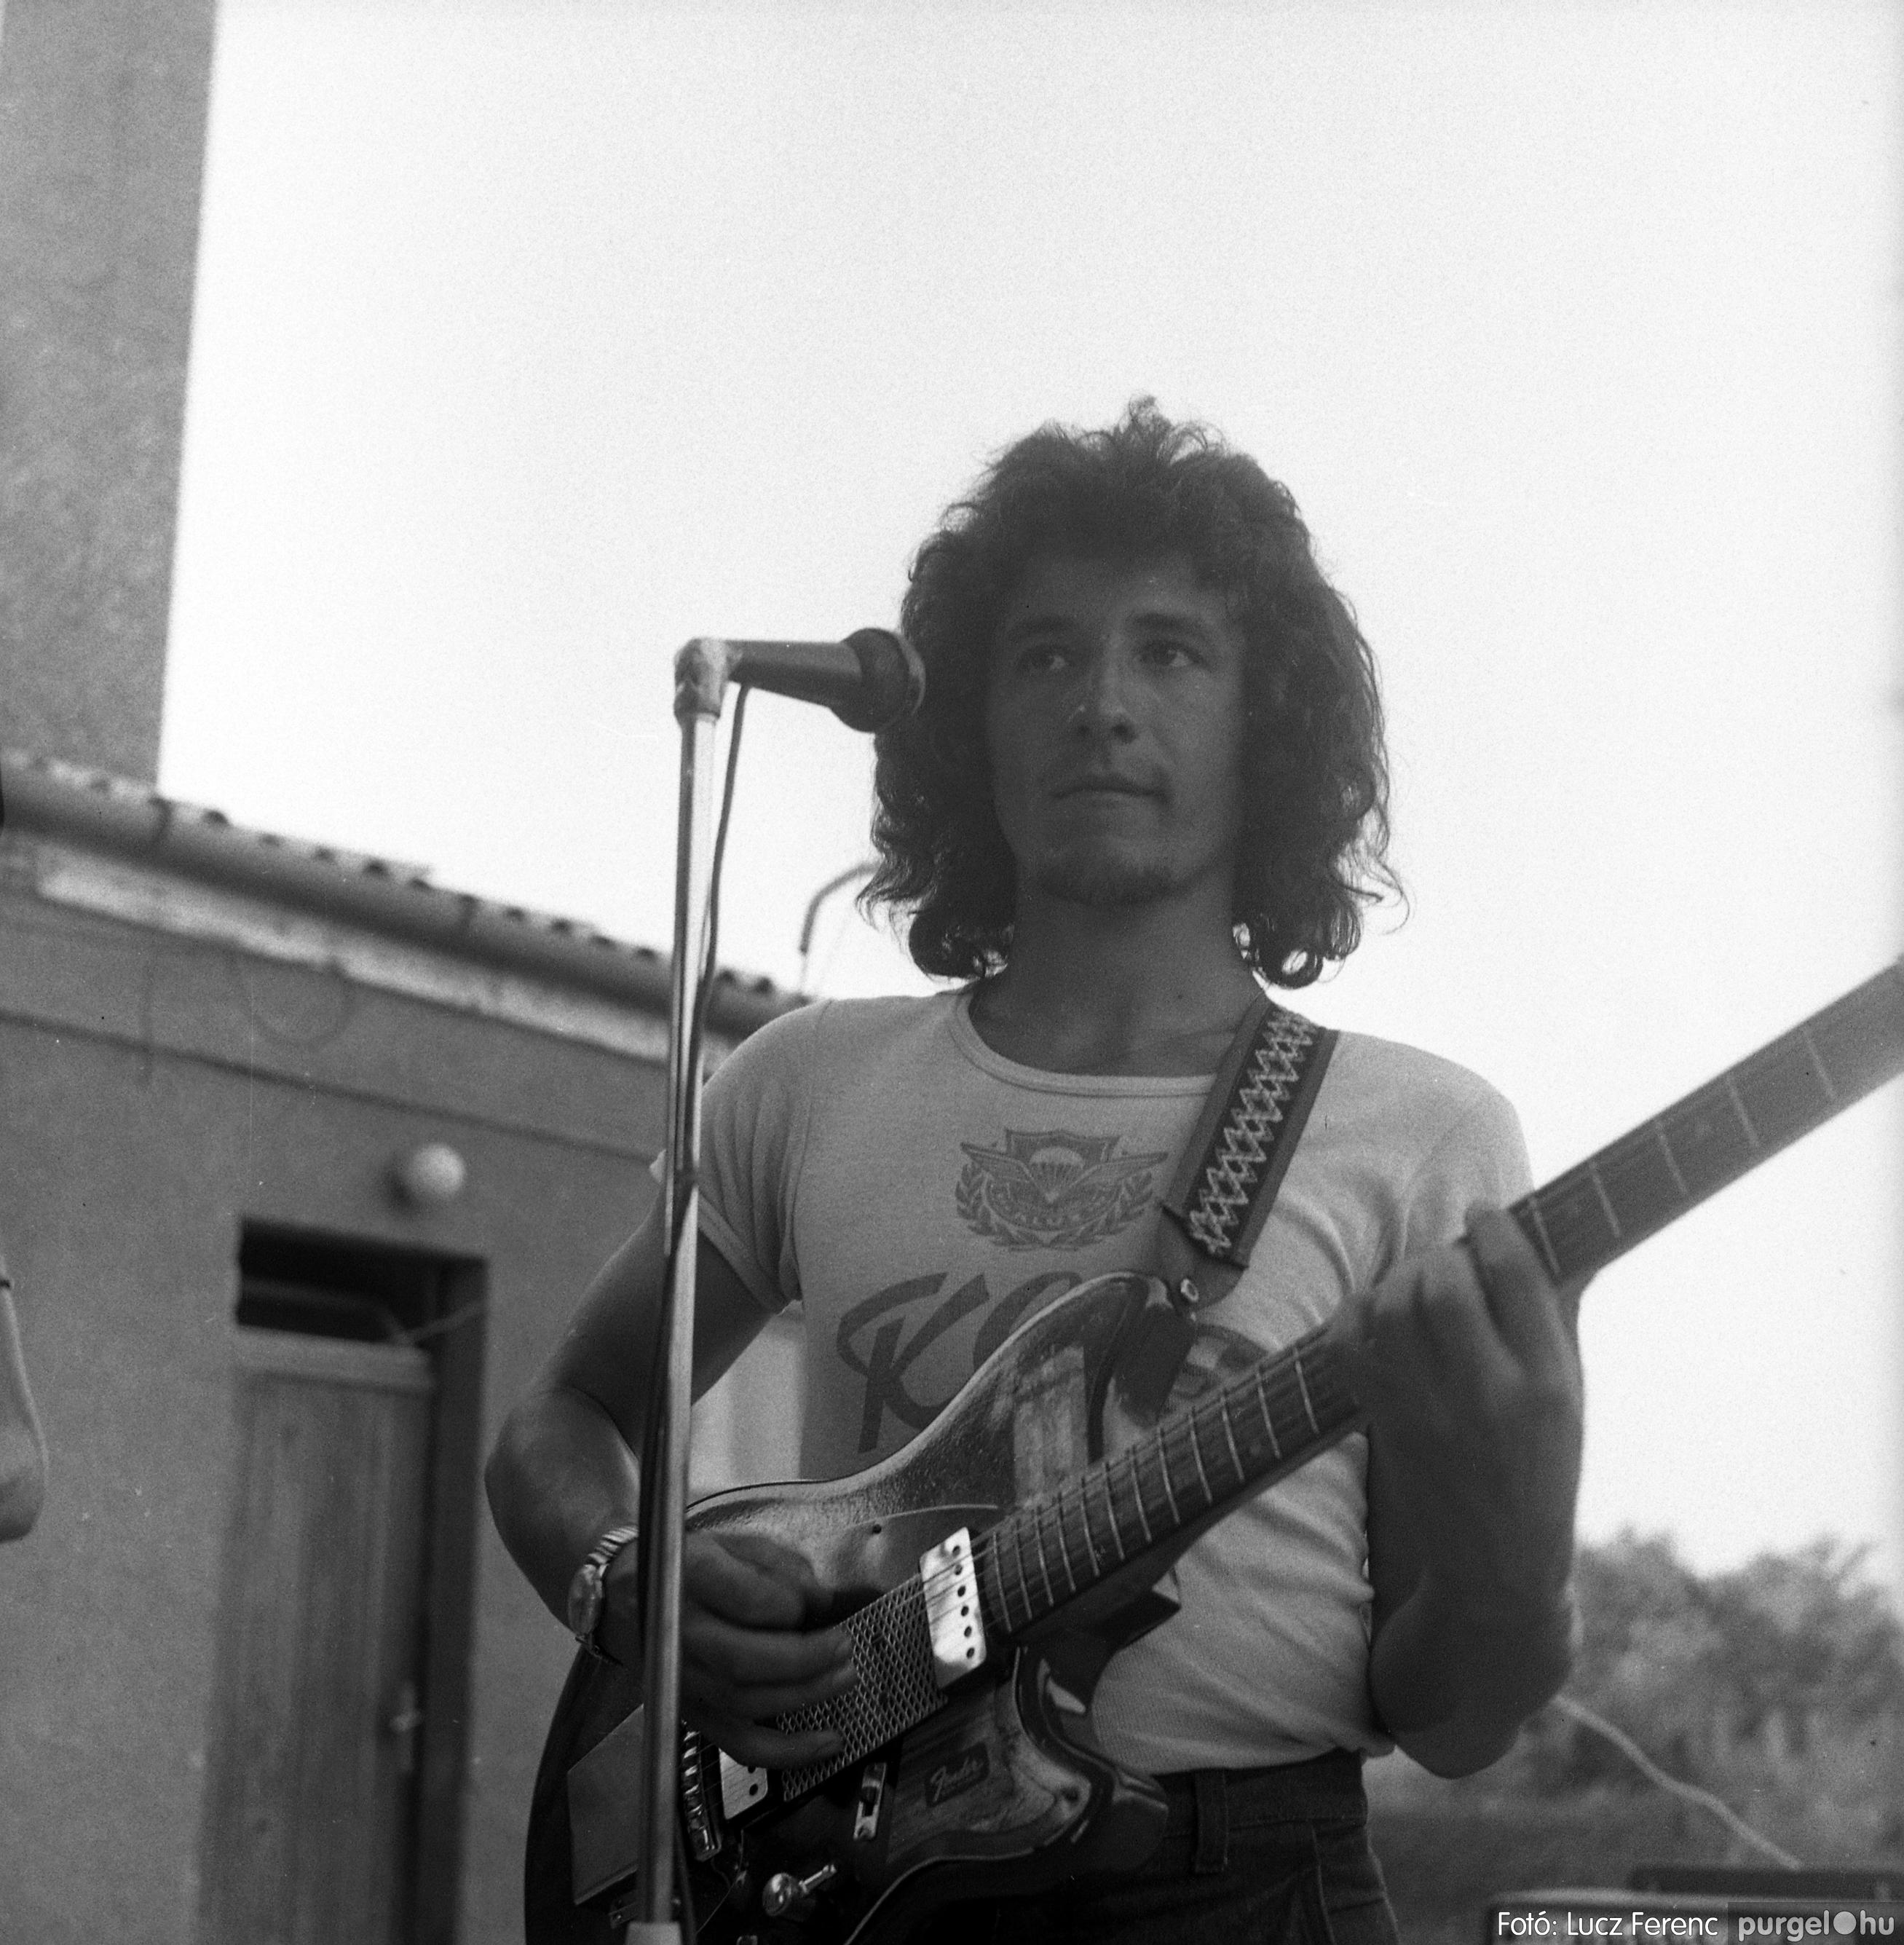 027. 1975. Buli a kultúrban 002. - Fotó: Lucz Ferenc.jpg